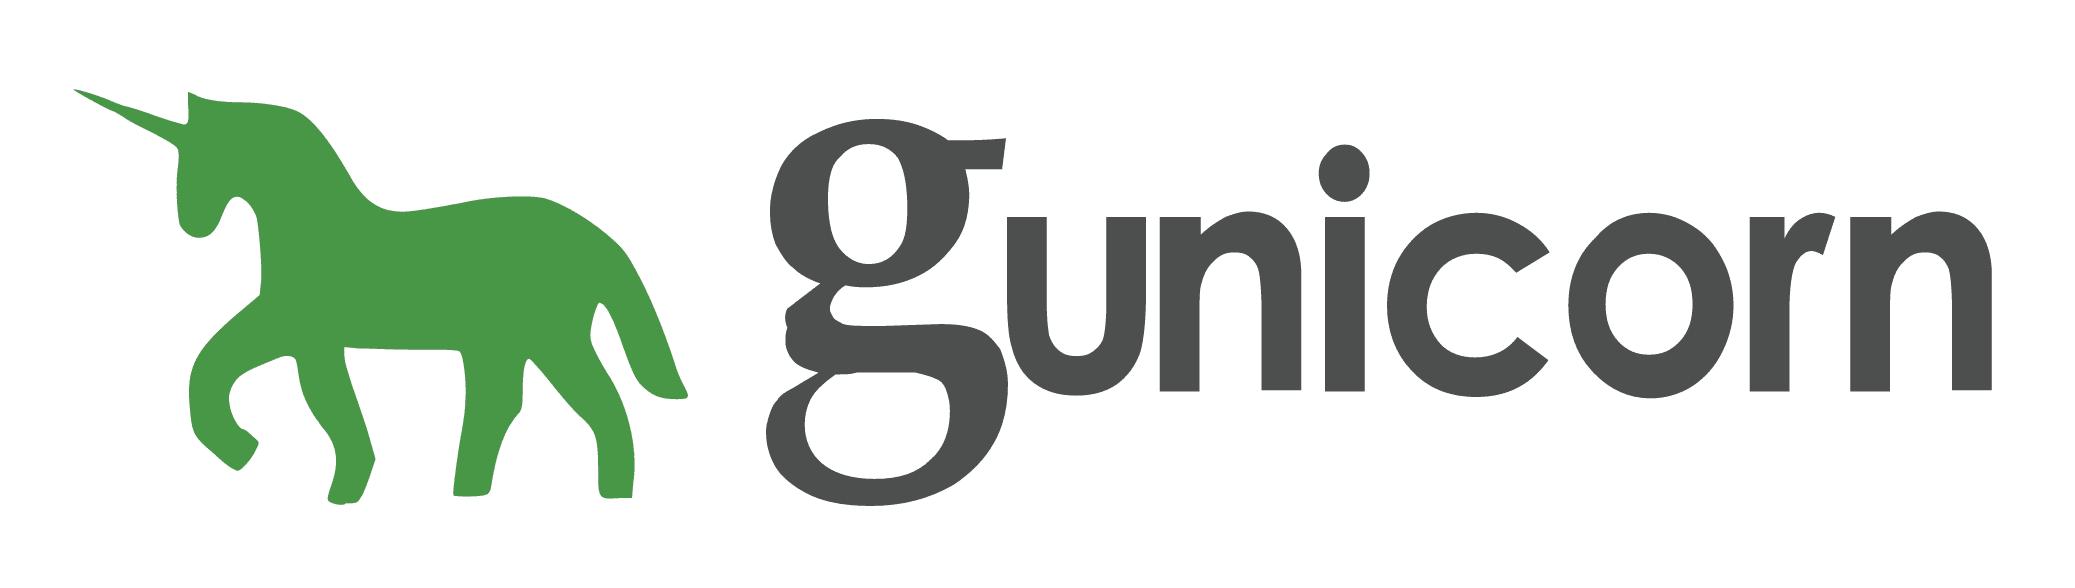 gunicorn_logo-1.png